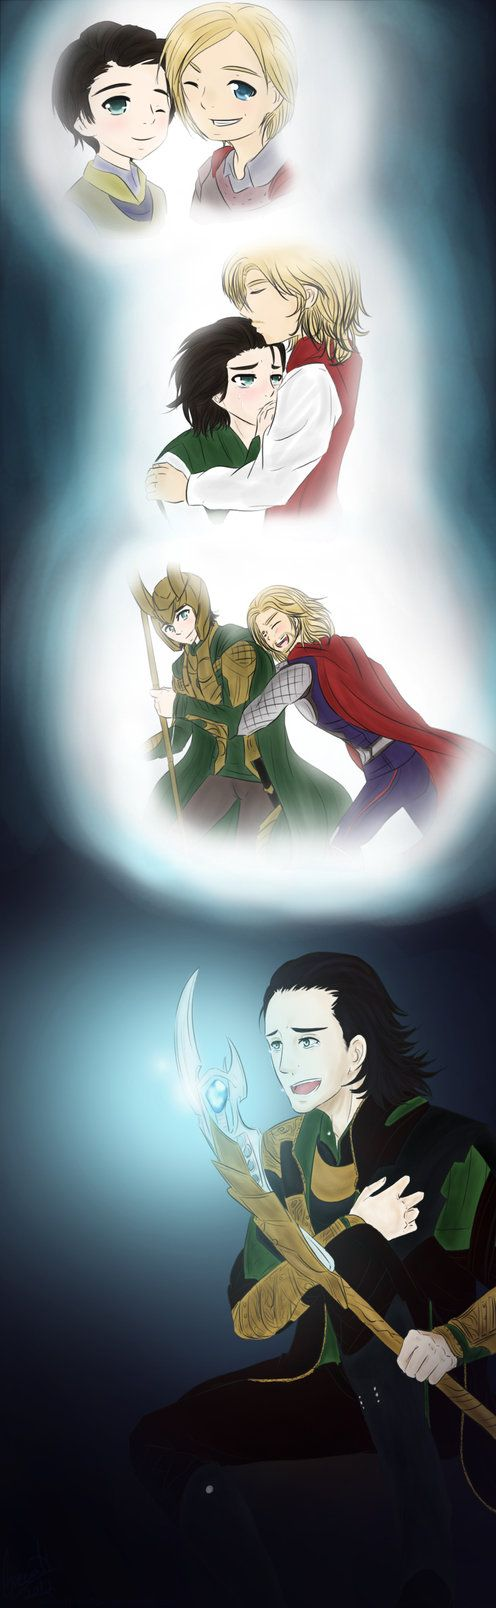 Loki feelings